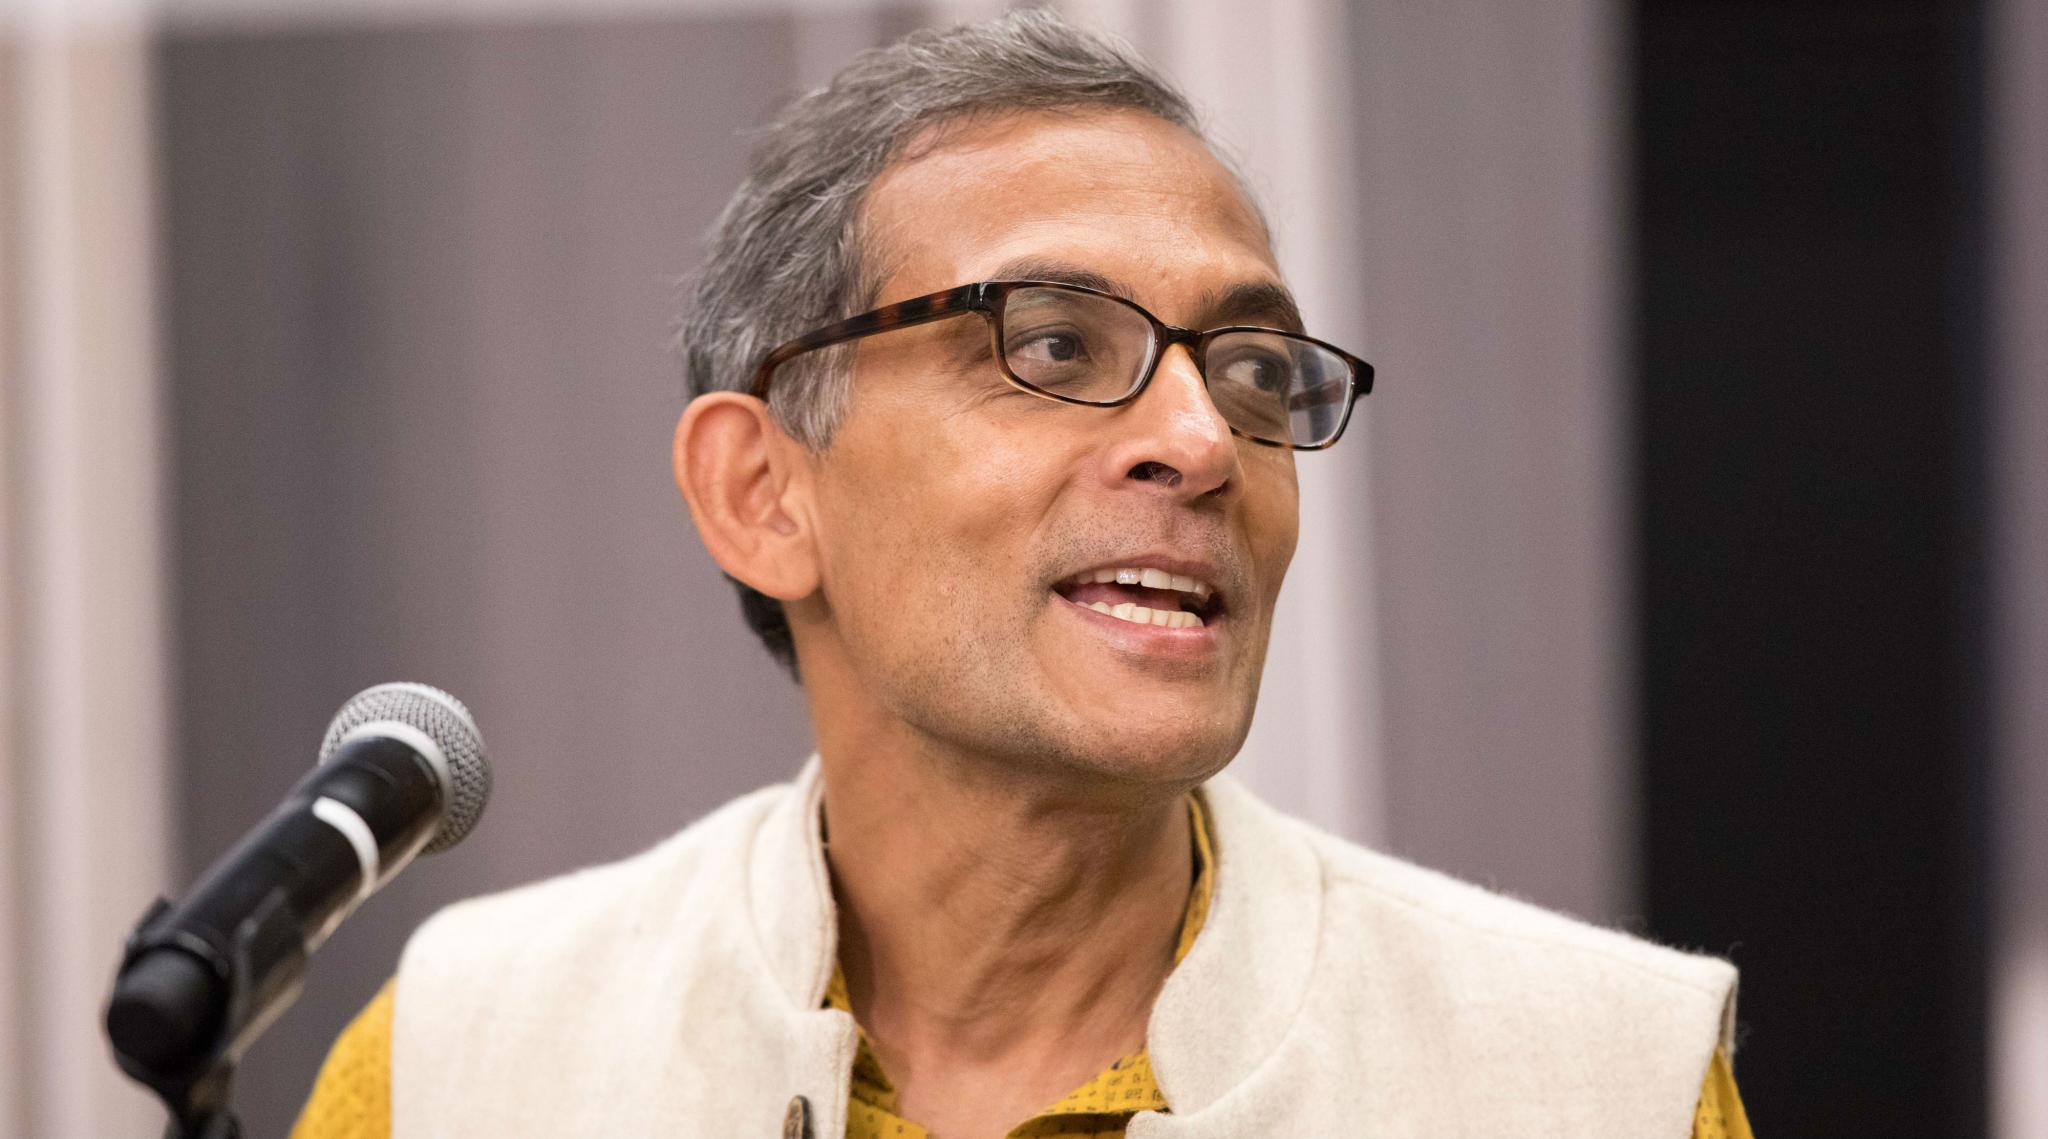 Nobel Laureate Abhijit Banerjee to Visit India This Week, Bengal Government Plans Gala Celebration